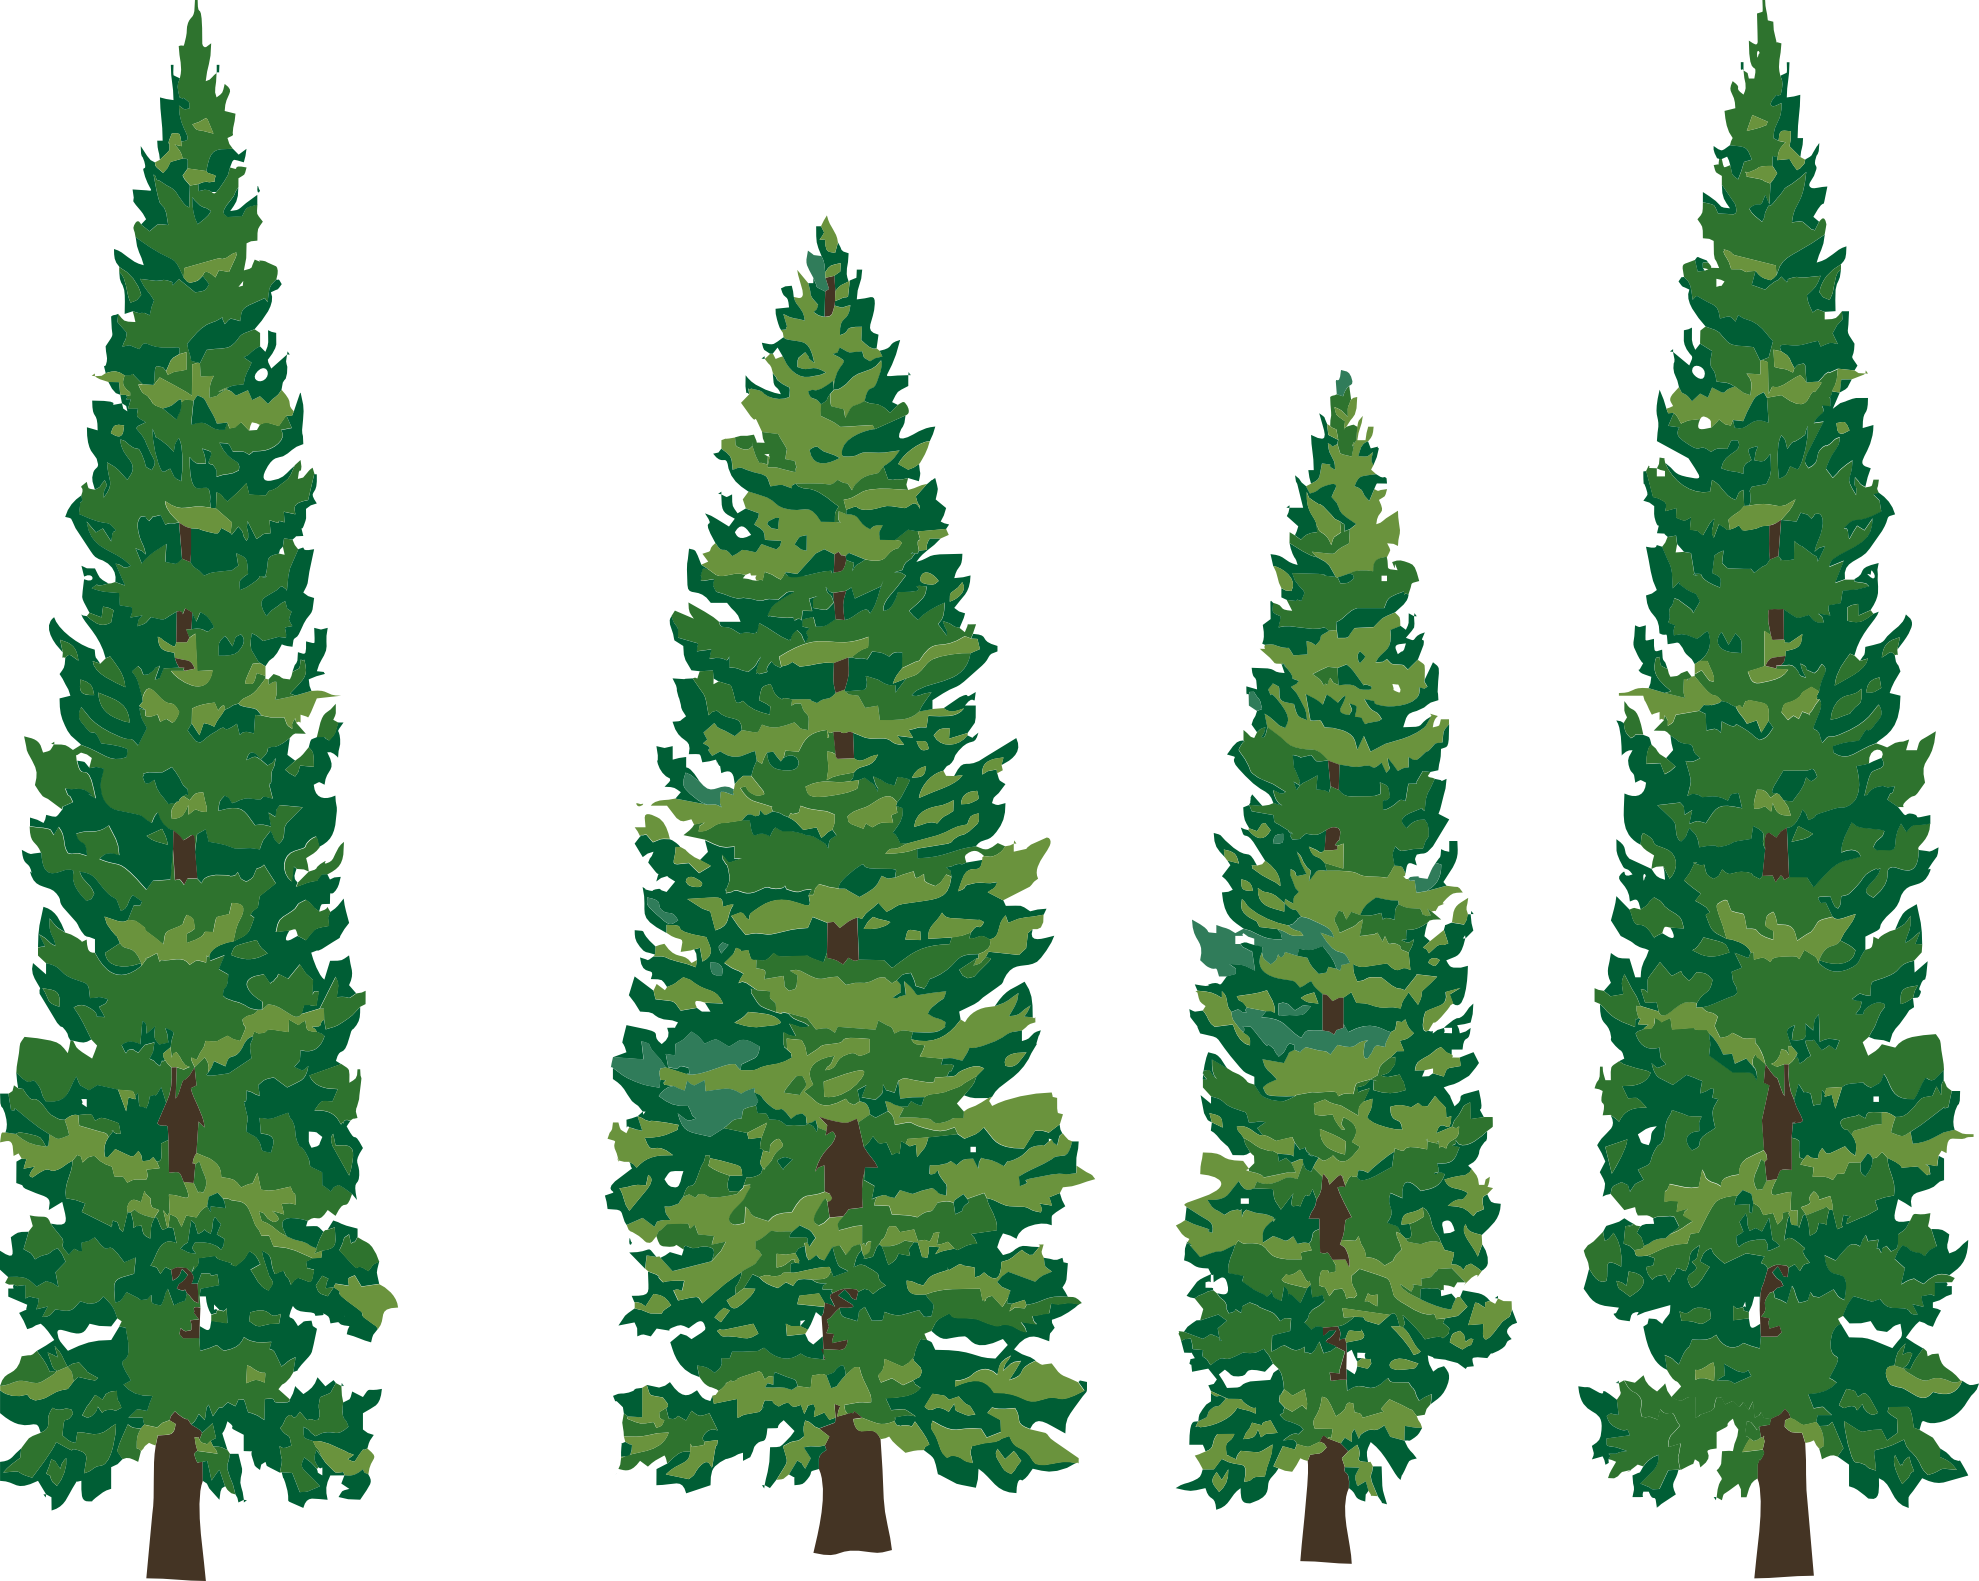 Clipart Pine Tree Clipart Panda Free Cli-Clipart Pine Tree Clipart Panda Free Clipart Images-1